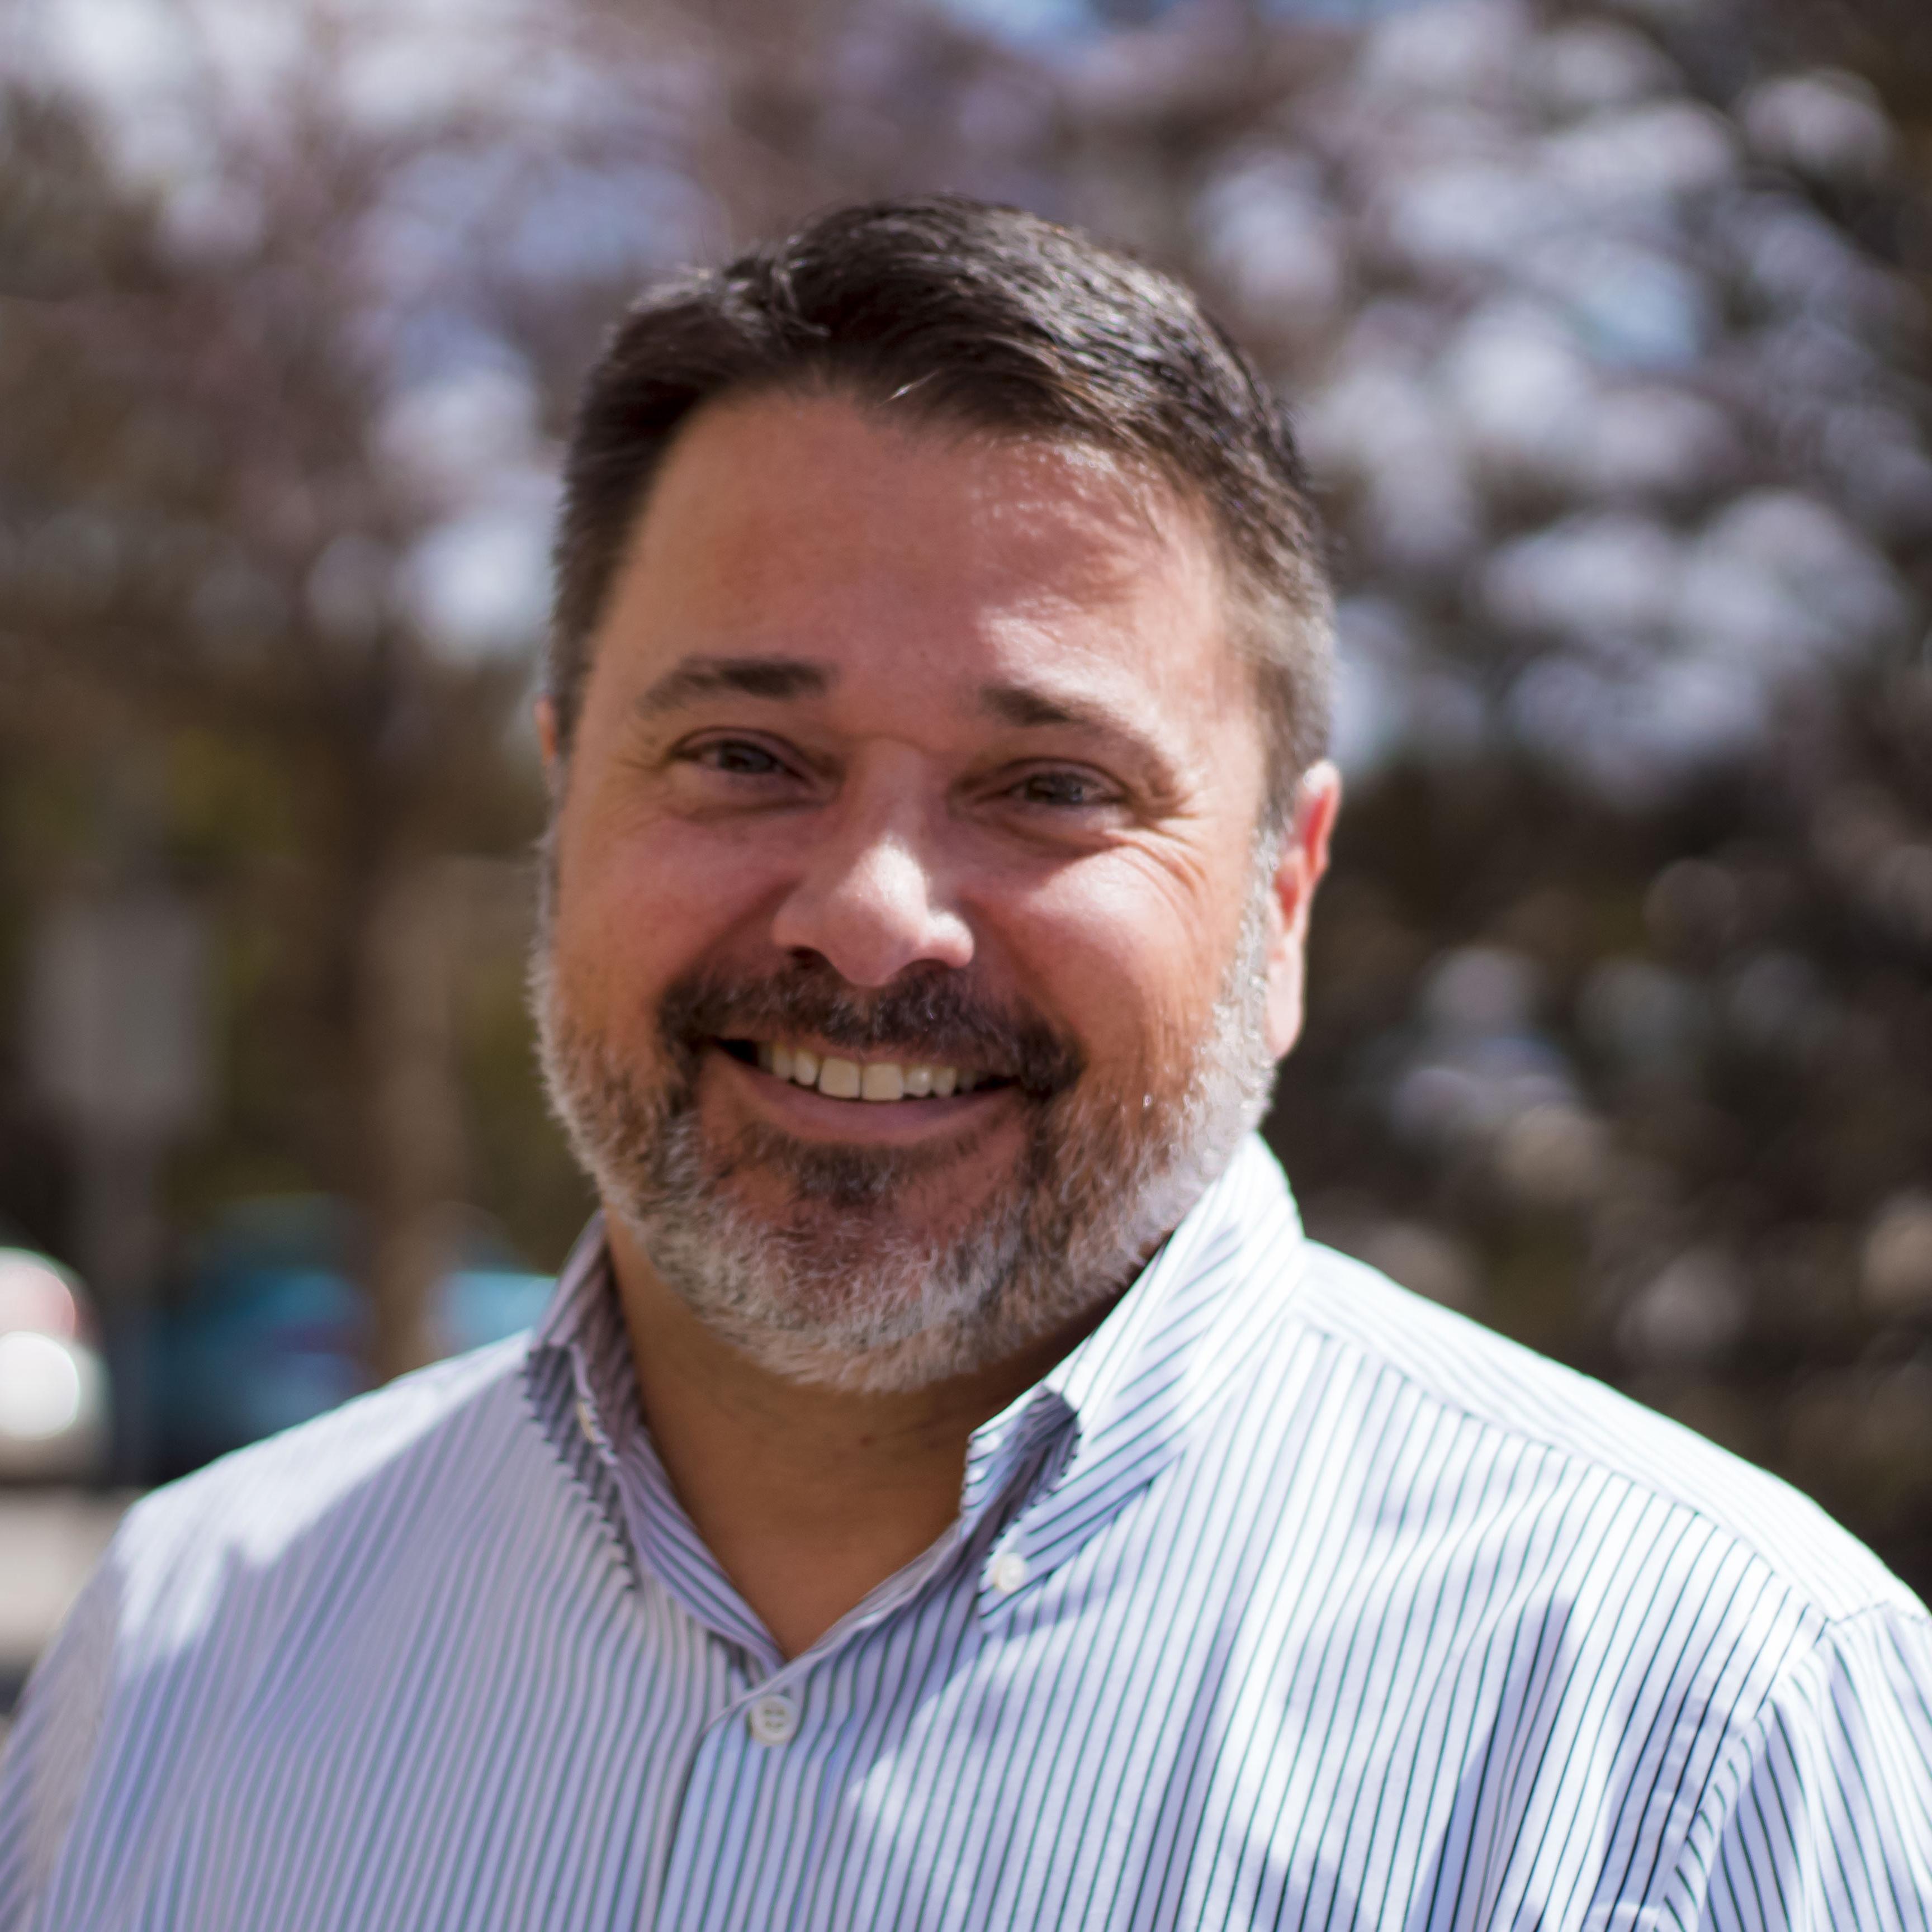 Daniel J Rosacci Ceo & President, Tony's Meats & Market